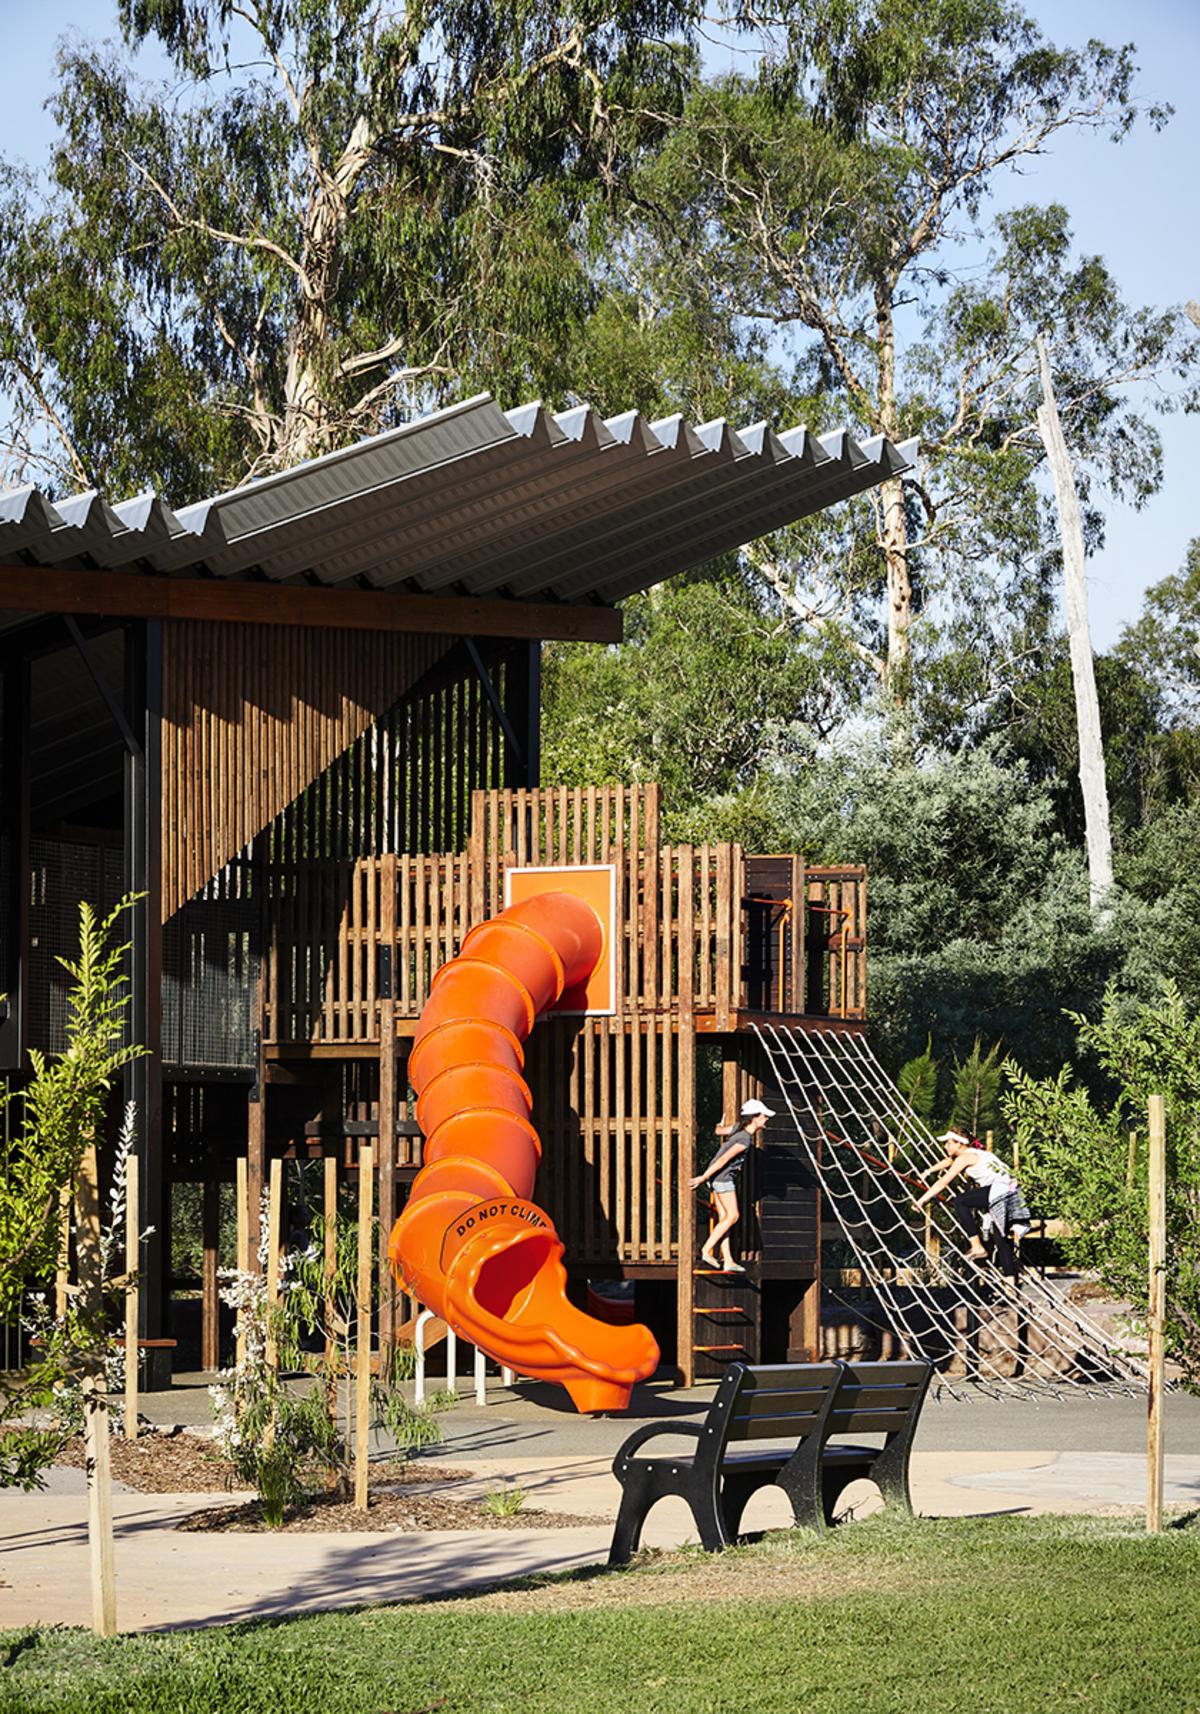 Playground design with slide